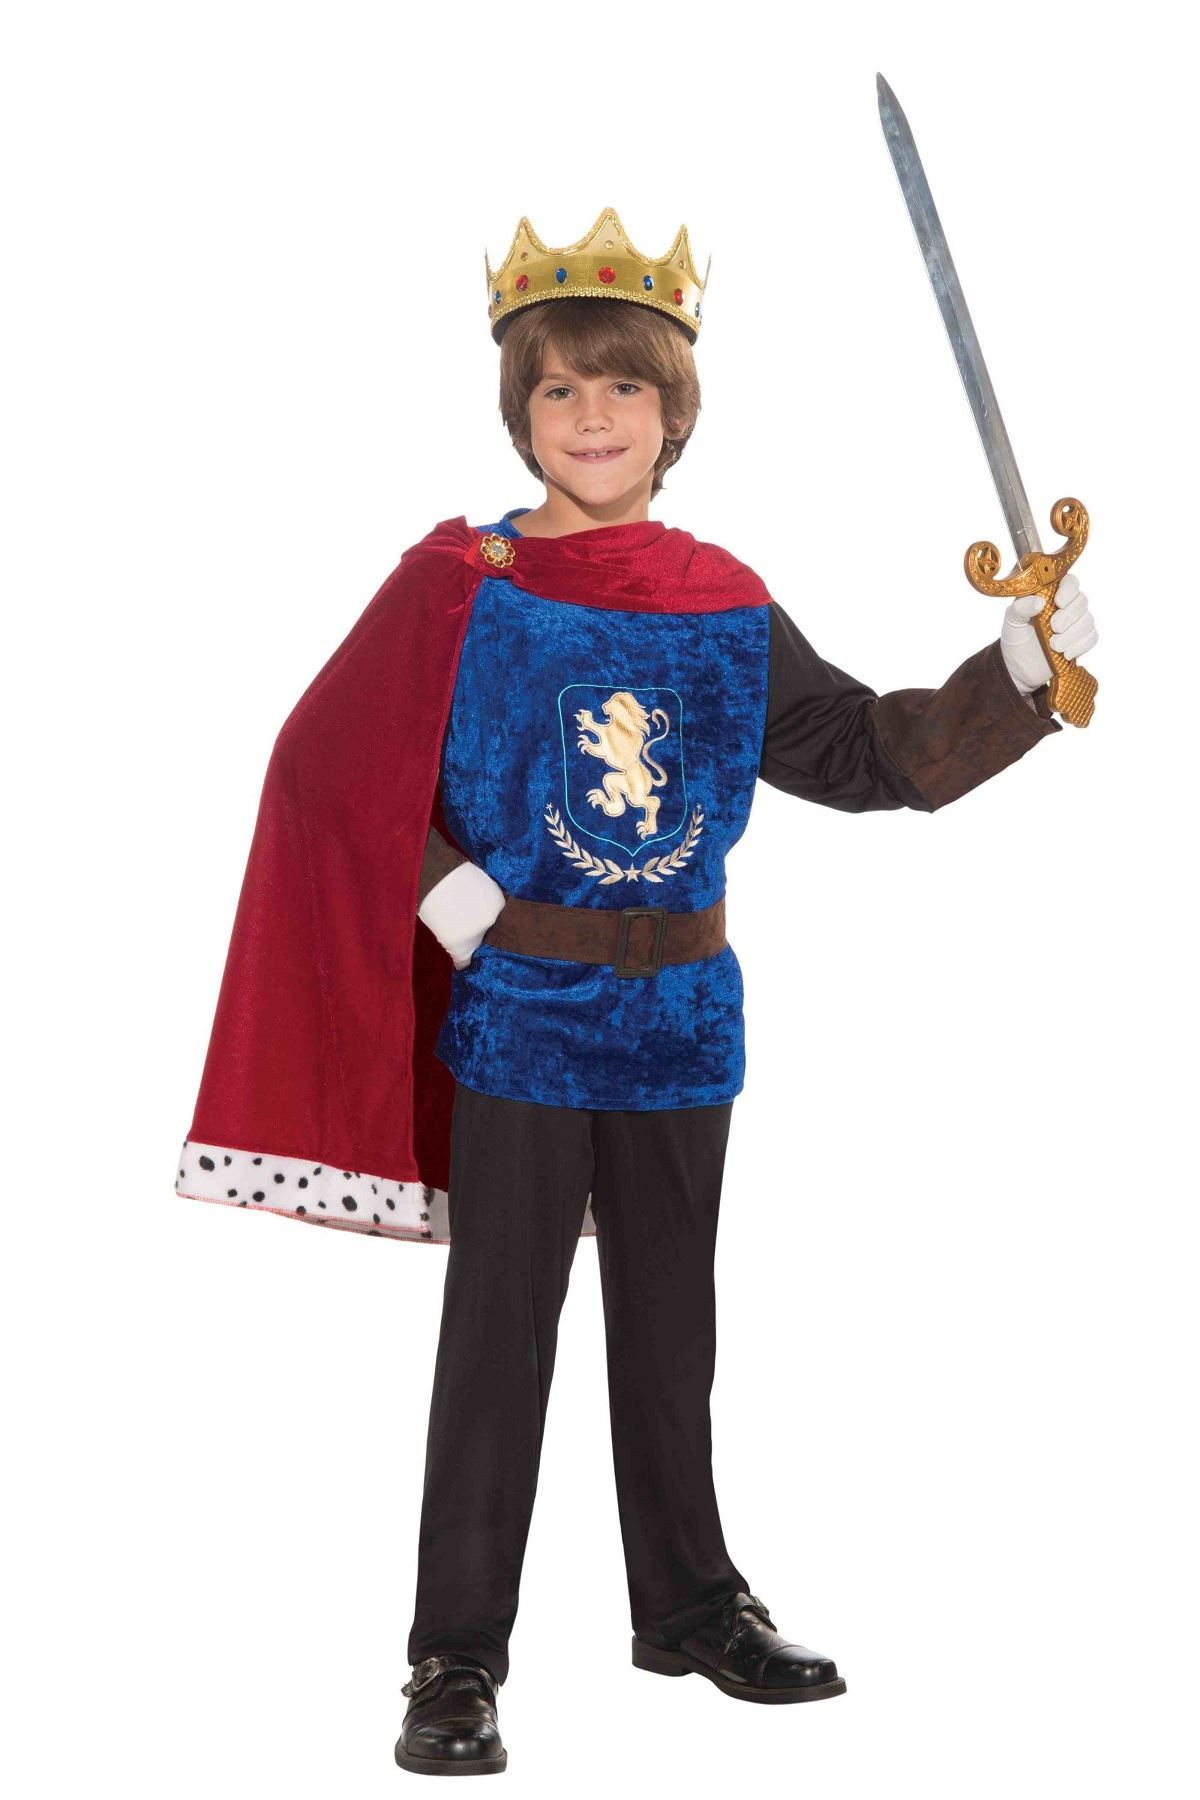 Childrens Fancy Dress Costume Boys Fantasy King Handsome Prince//Knight